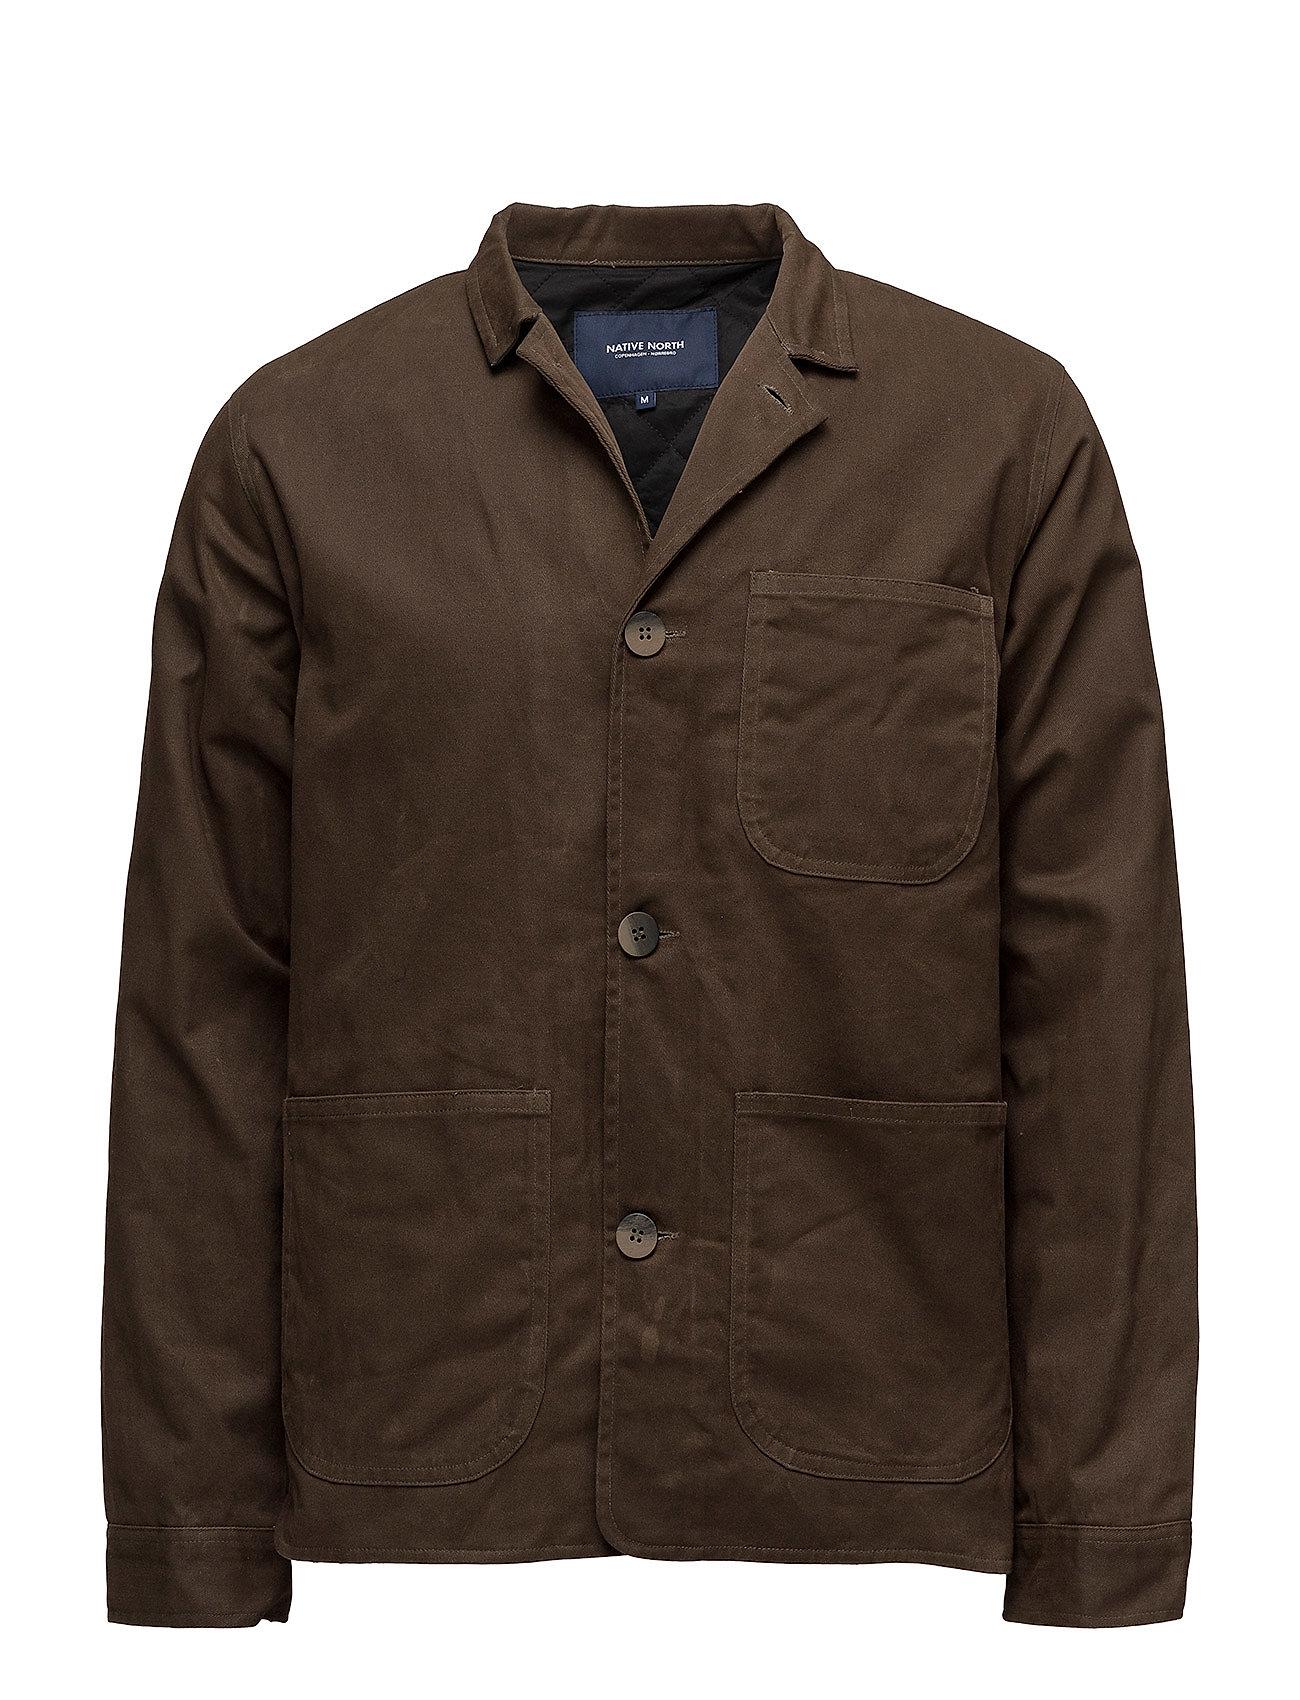 native north Waxed utility jacket på boozt.com dk